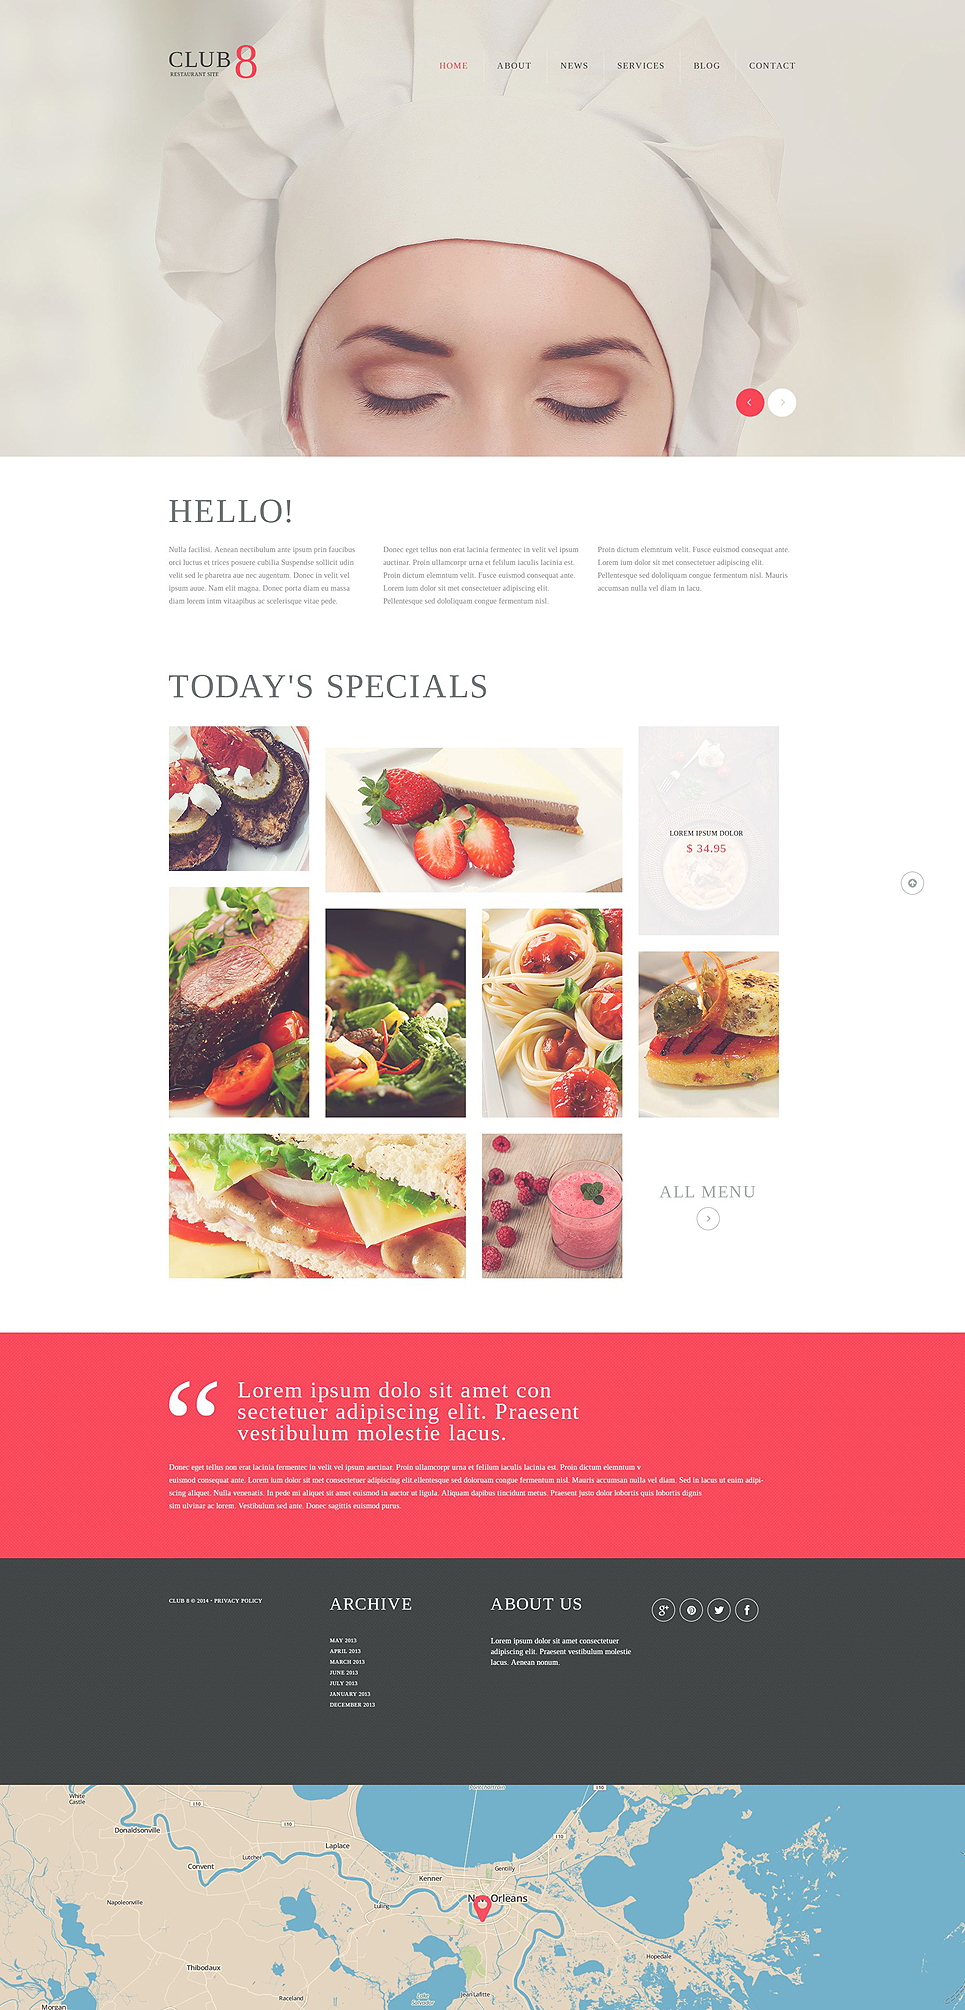 Адаптивный шаблон сайта на тему кафе и ресторан #51842